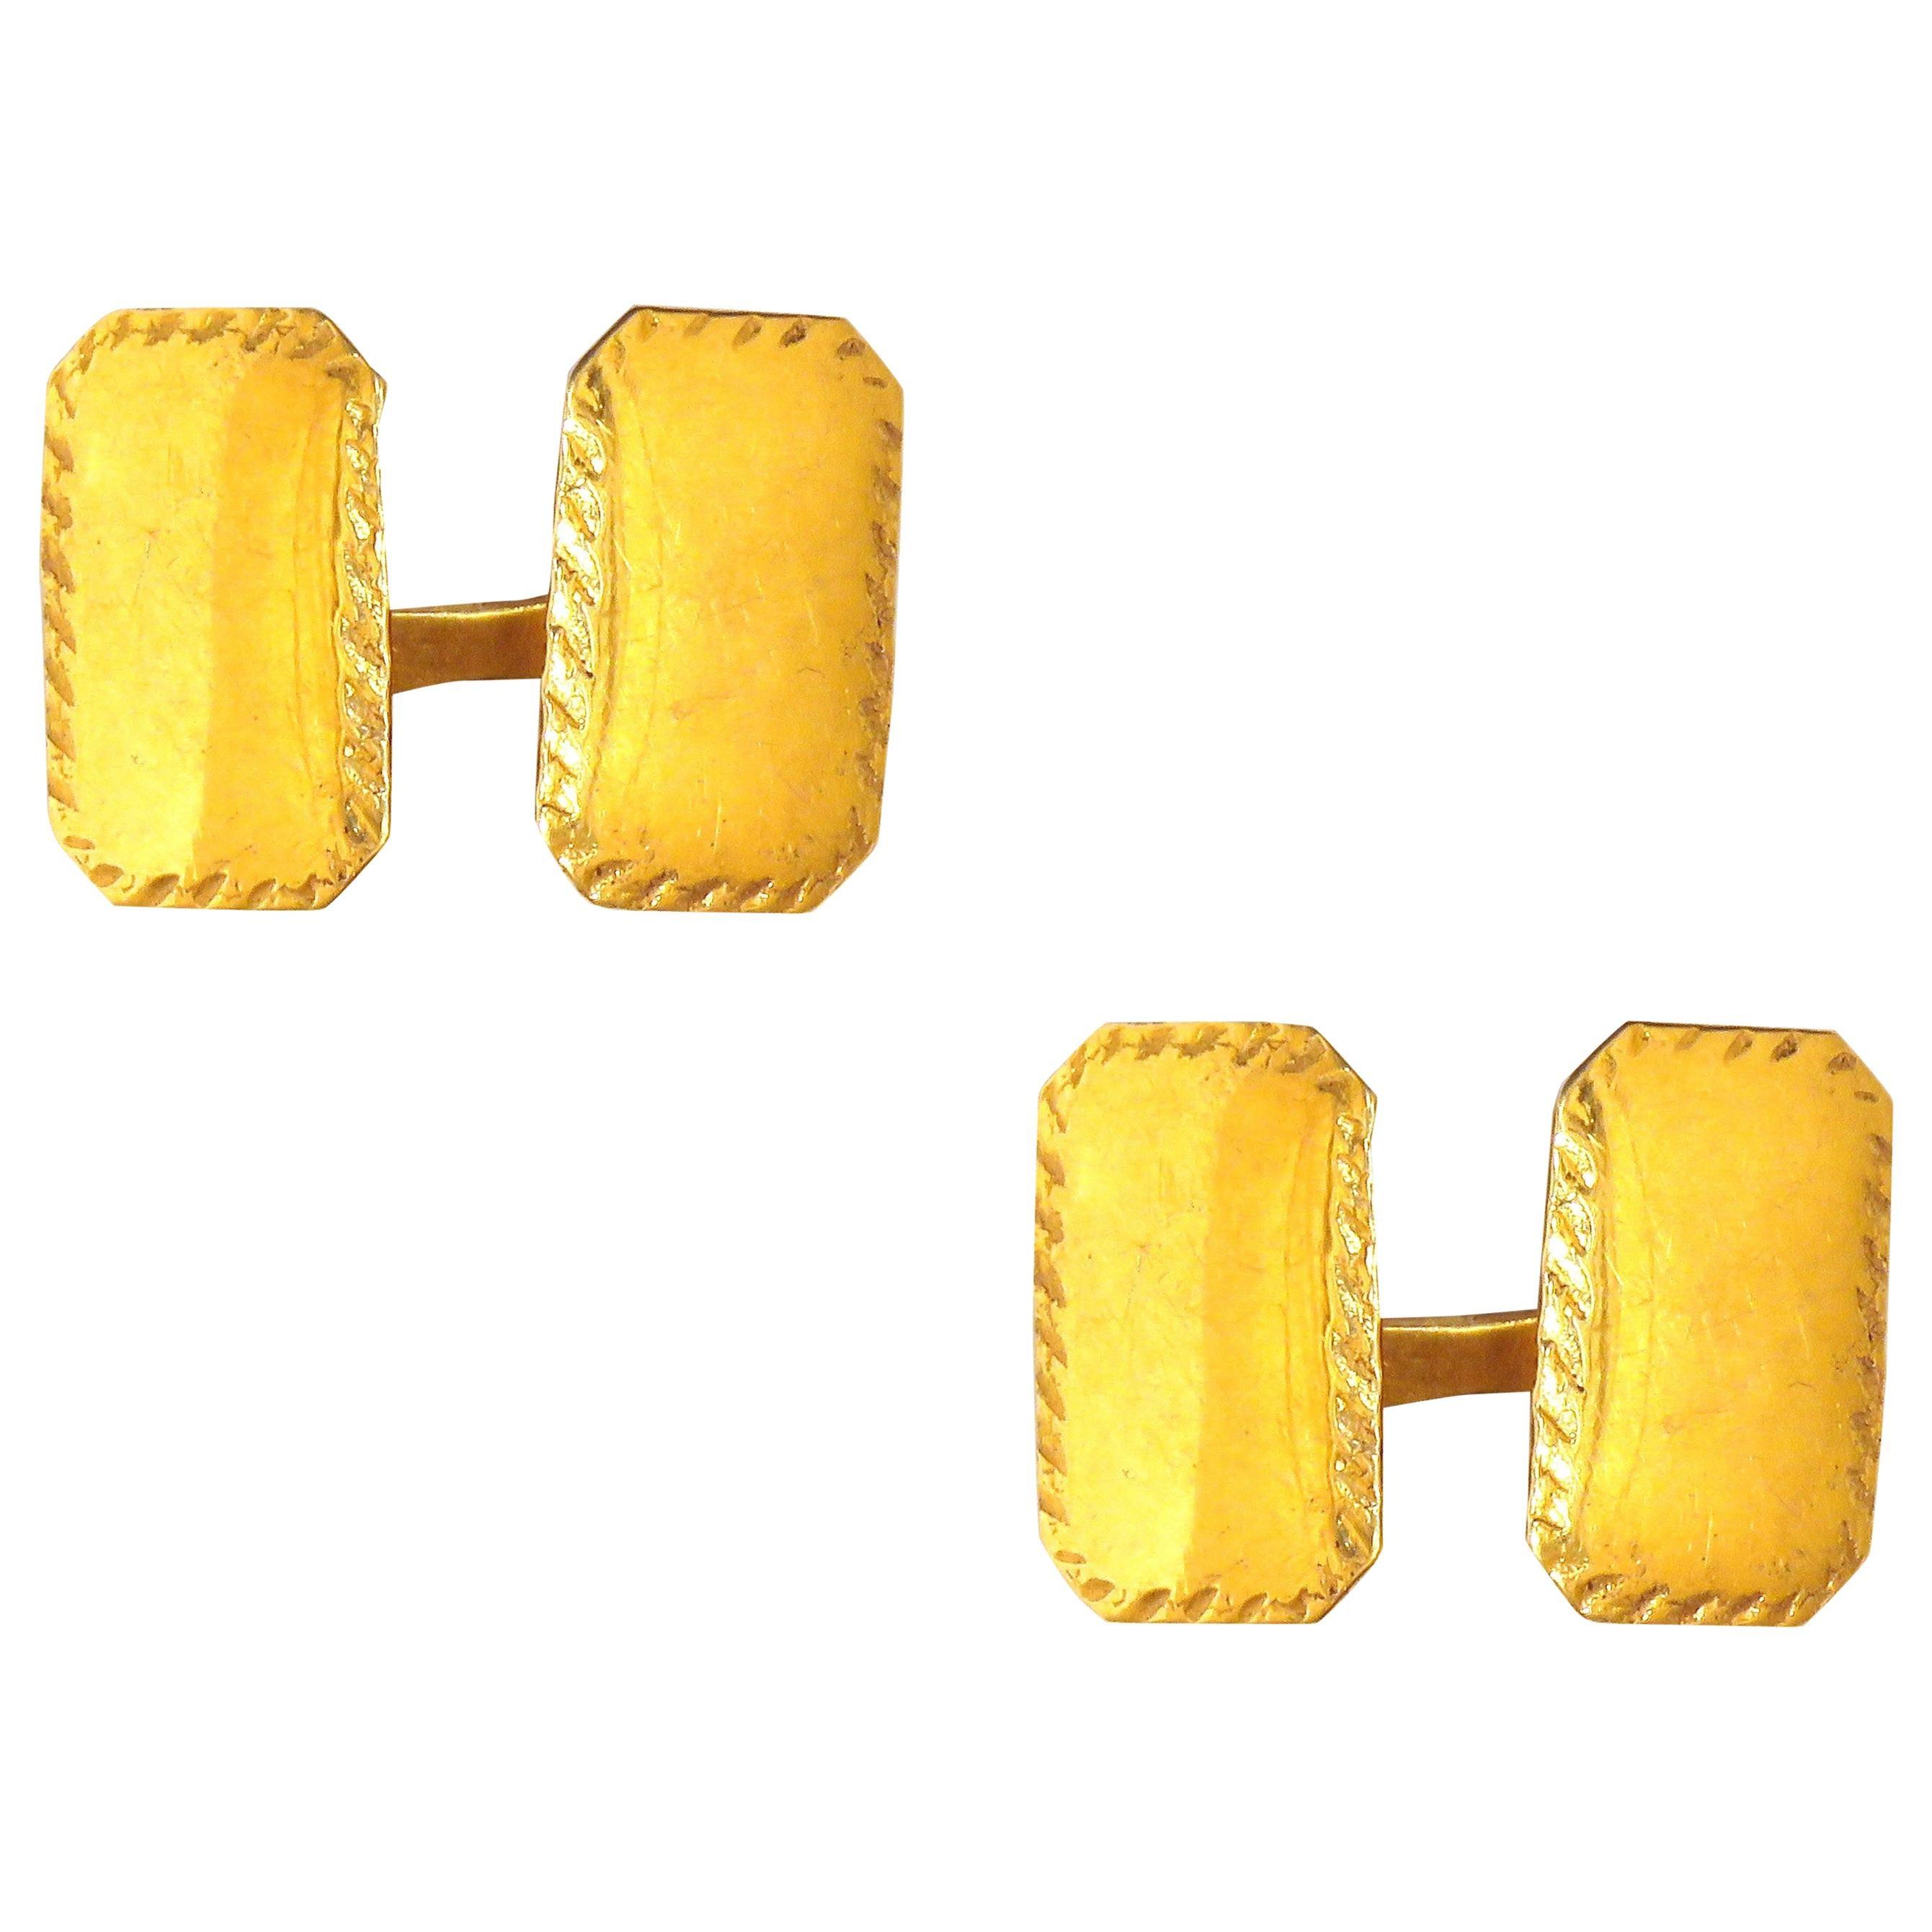 Antique 18 Karat Yellow Gold Cufflinks Handcrafted in Italy